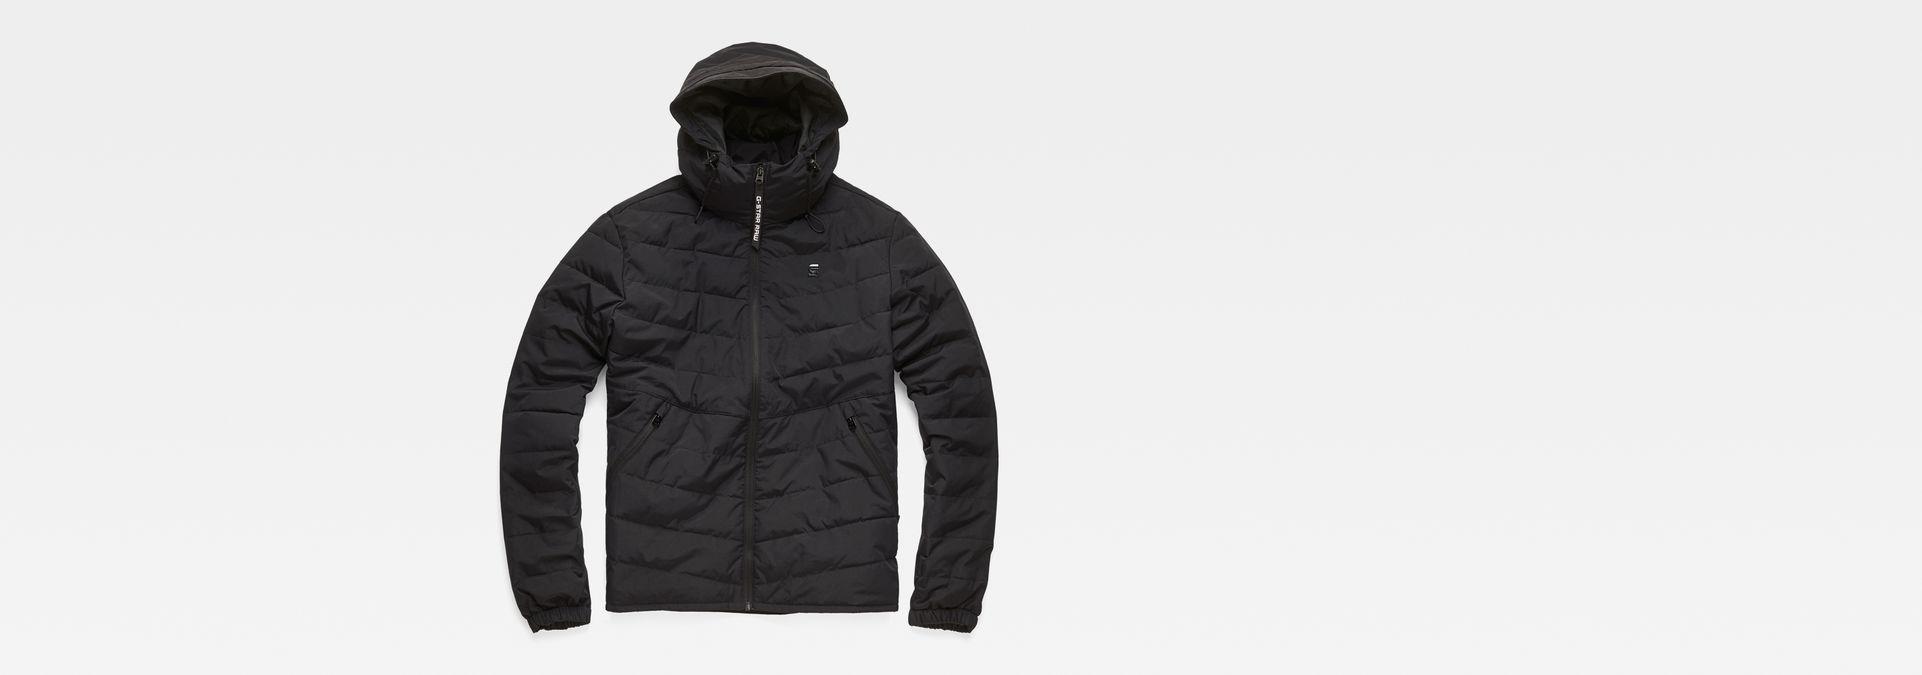 Attacc Quilted Hooded Jacket | Dark Black | Men | G Star RAW®